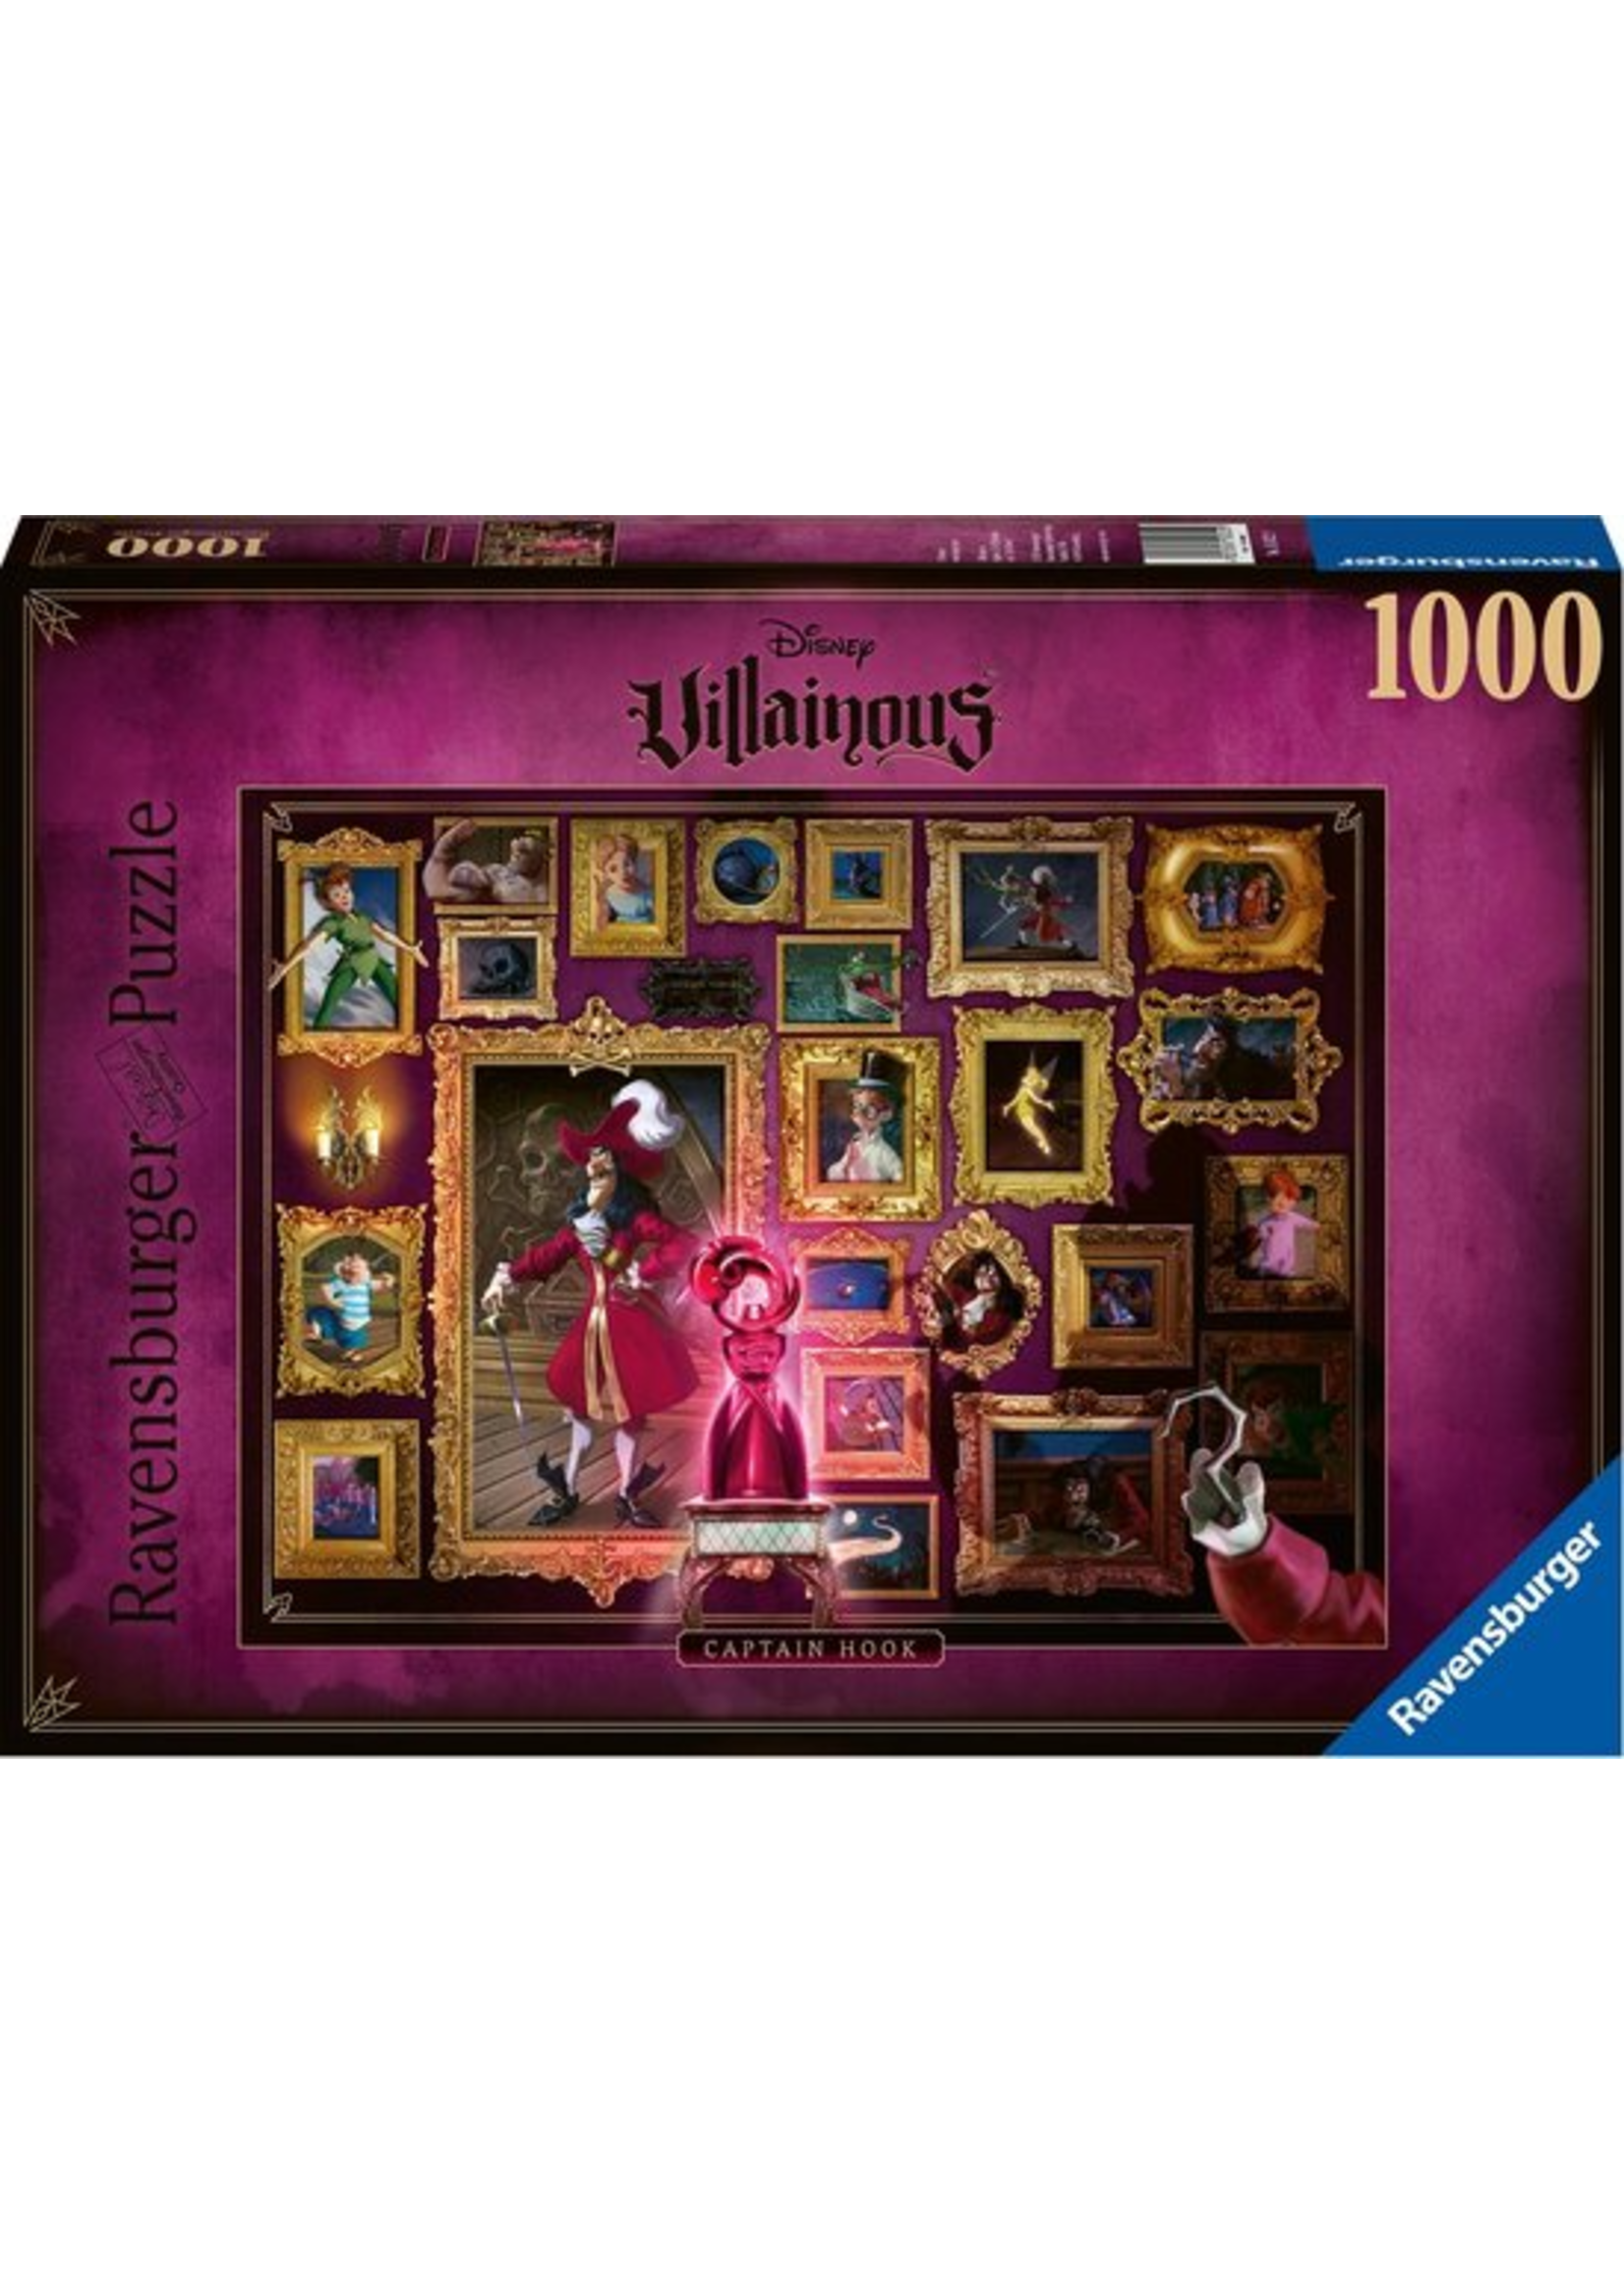 Disney Villainous - Captain Hook  (1000)